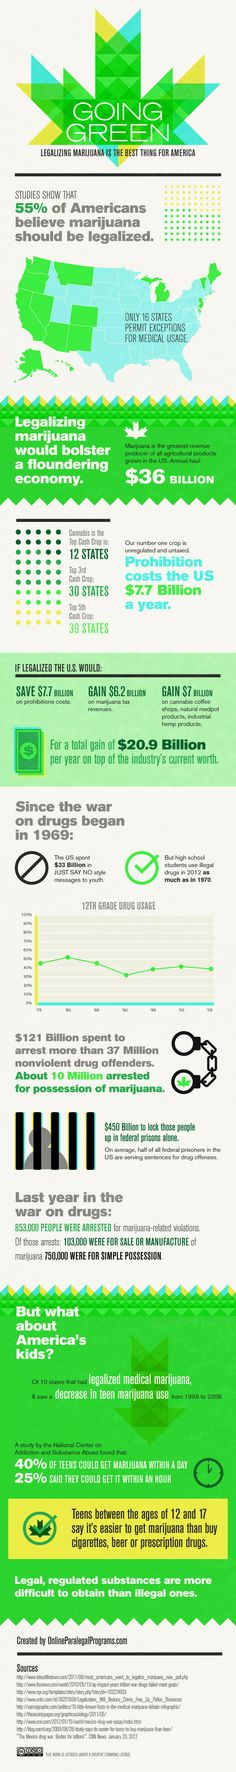 Economic Issues of Legalizing Drugs Essay